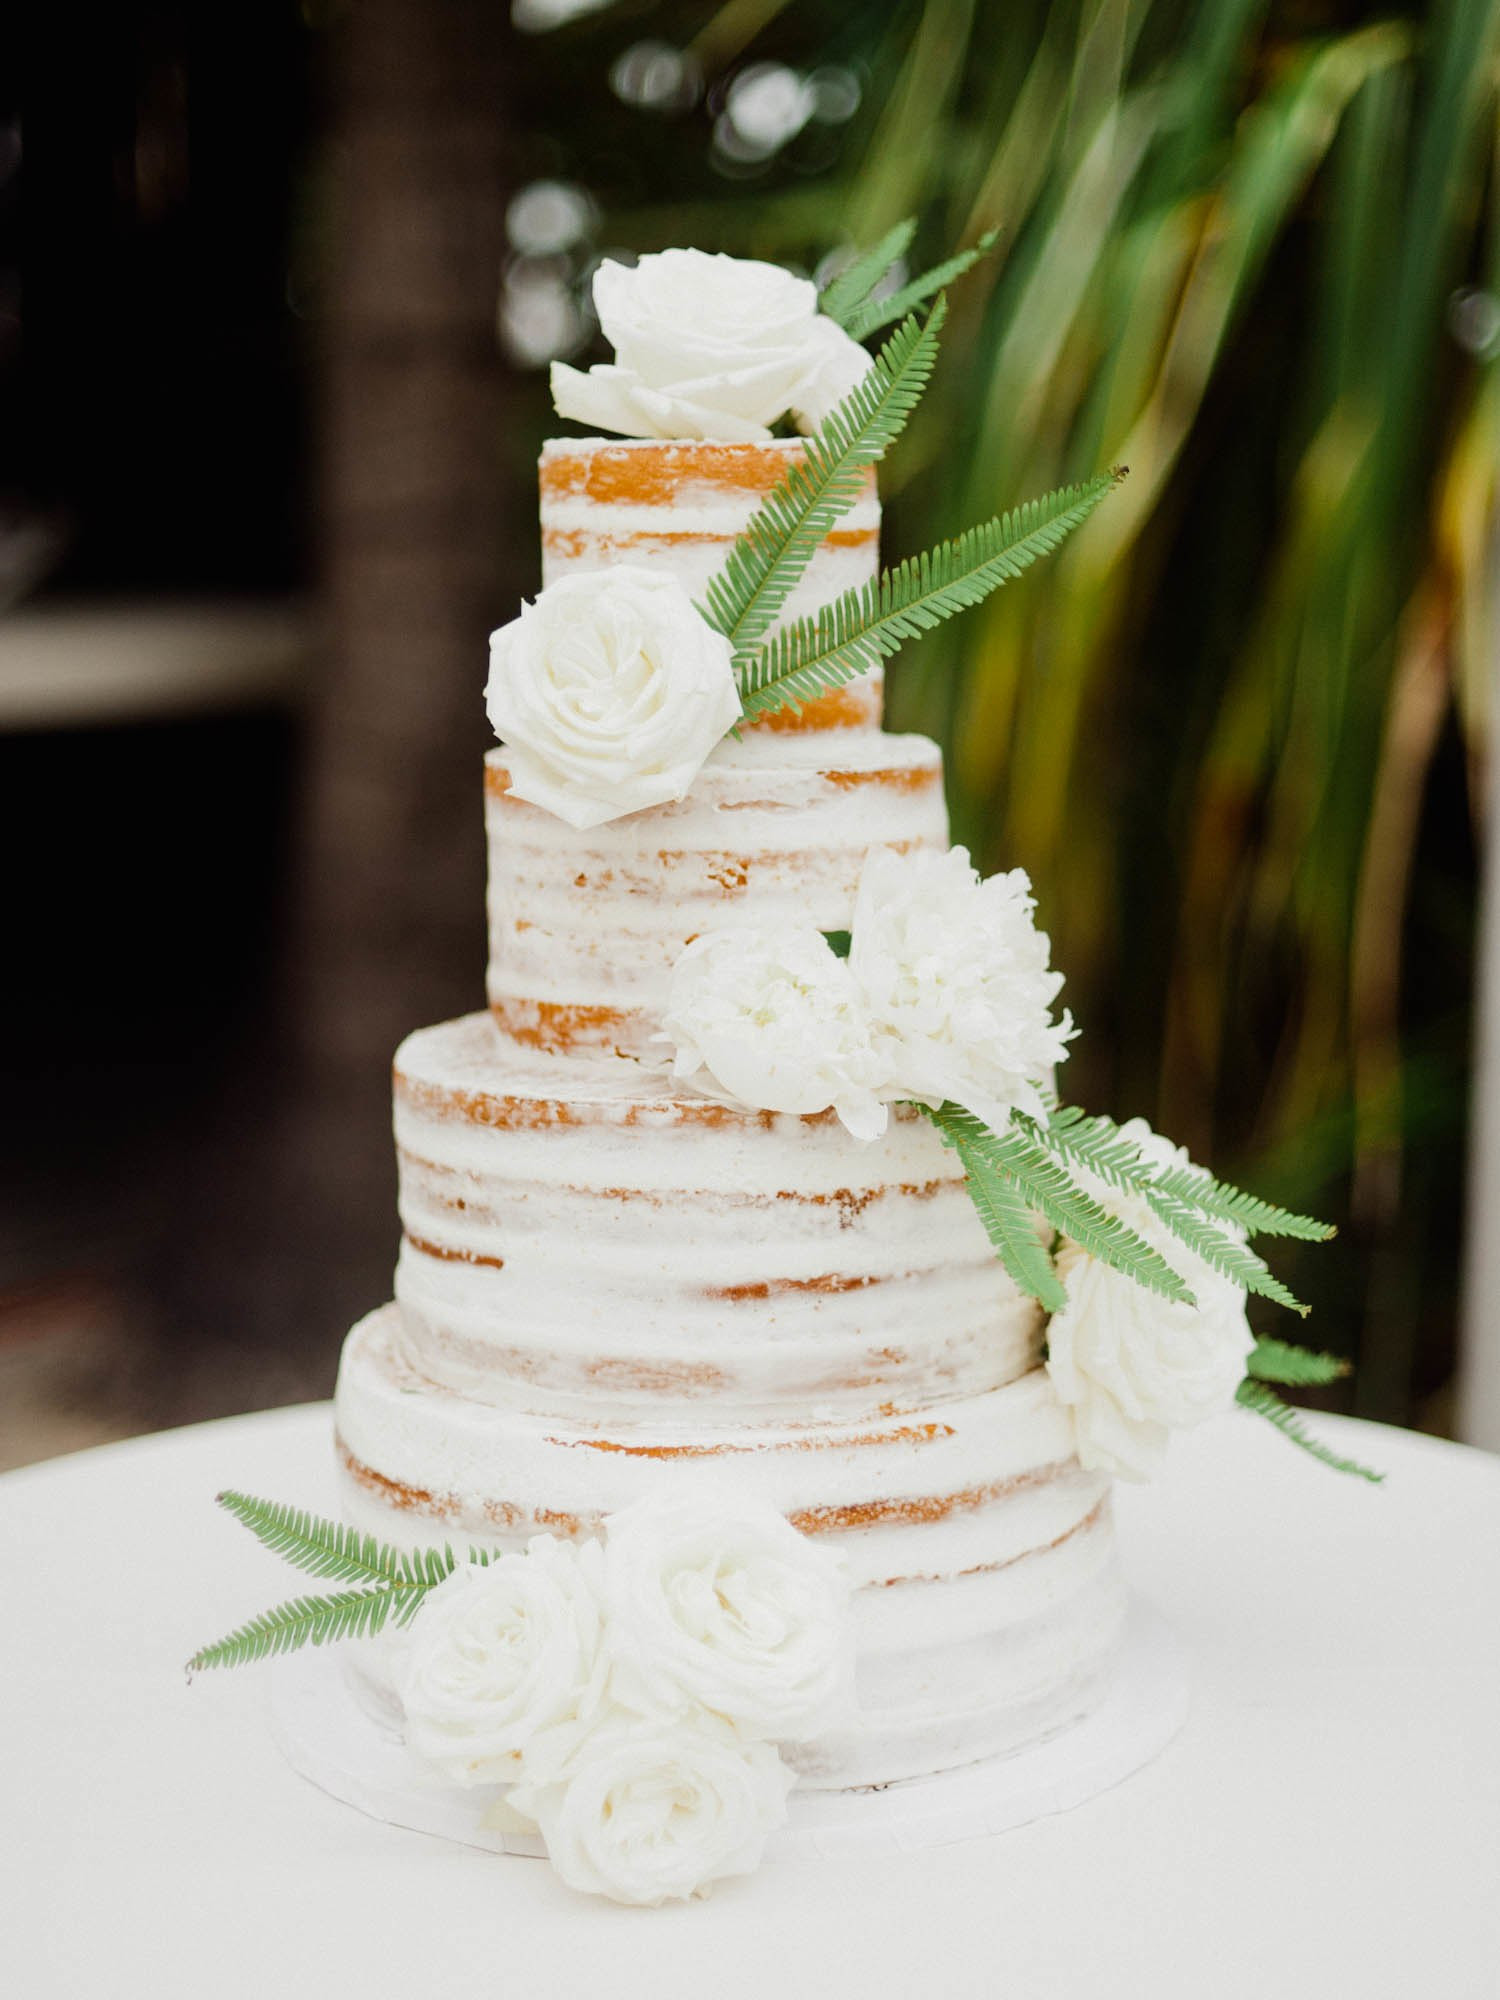 Naked Wedding Cakes  Sweet and Simple Naked Wedding Cakes